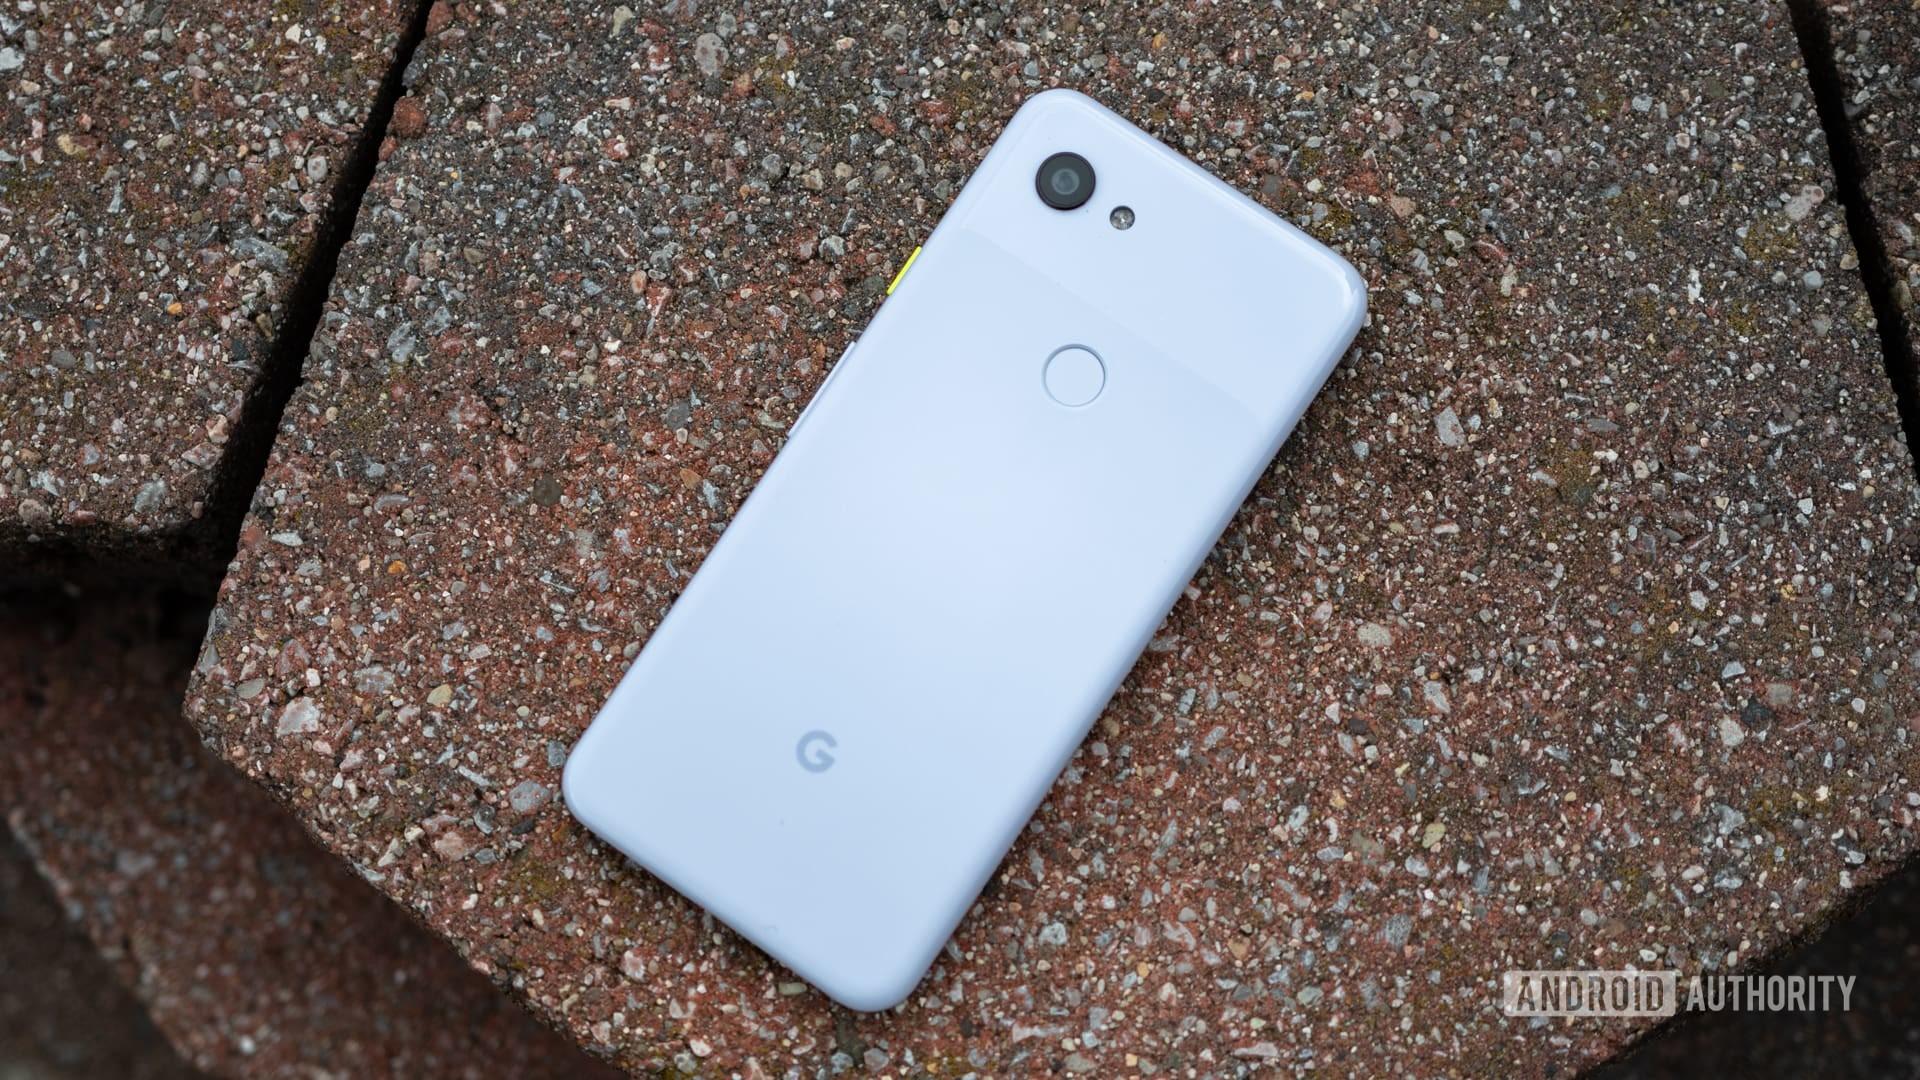 Google Pixel 3a phone on Google Fi